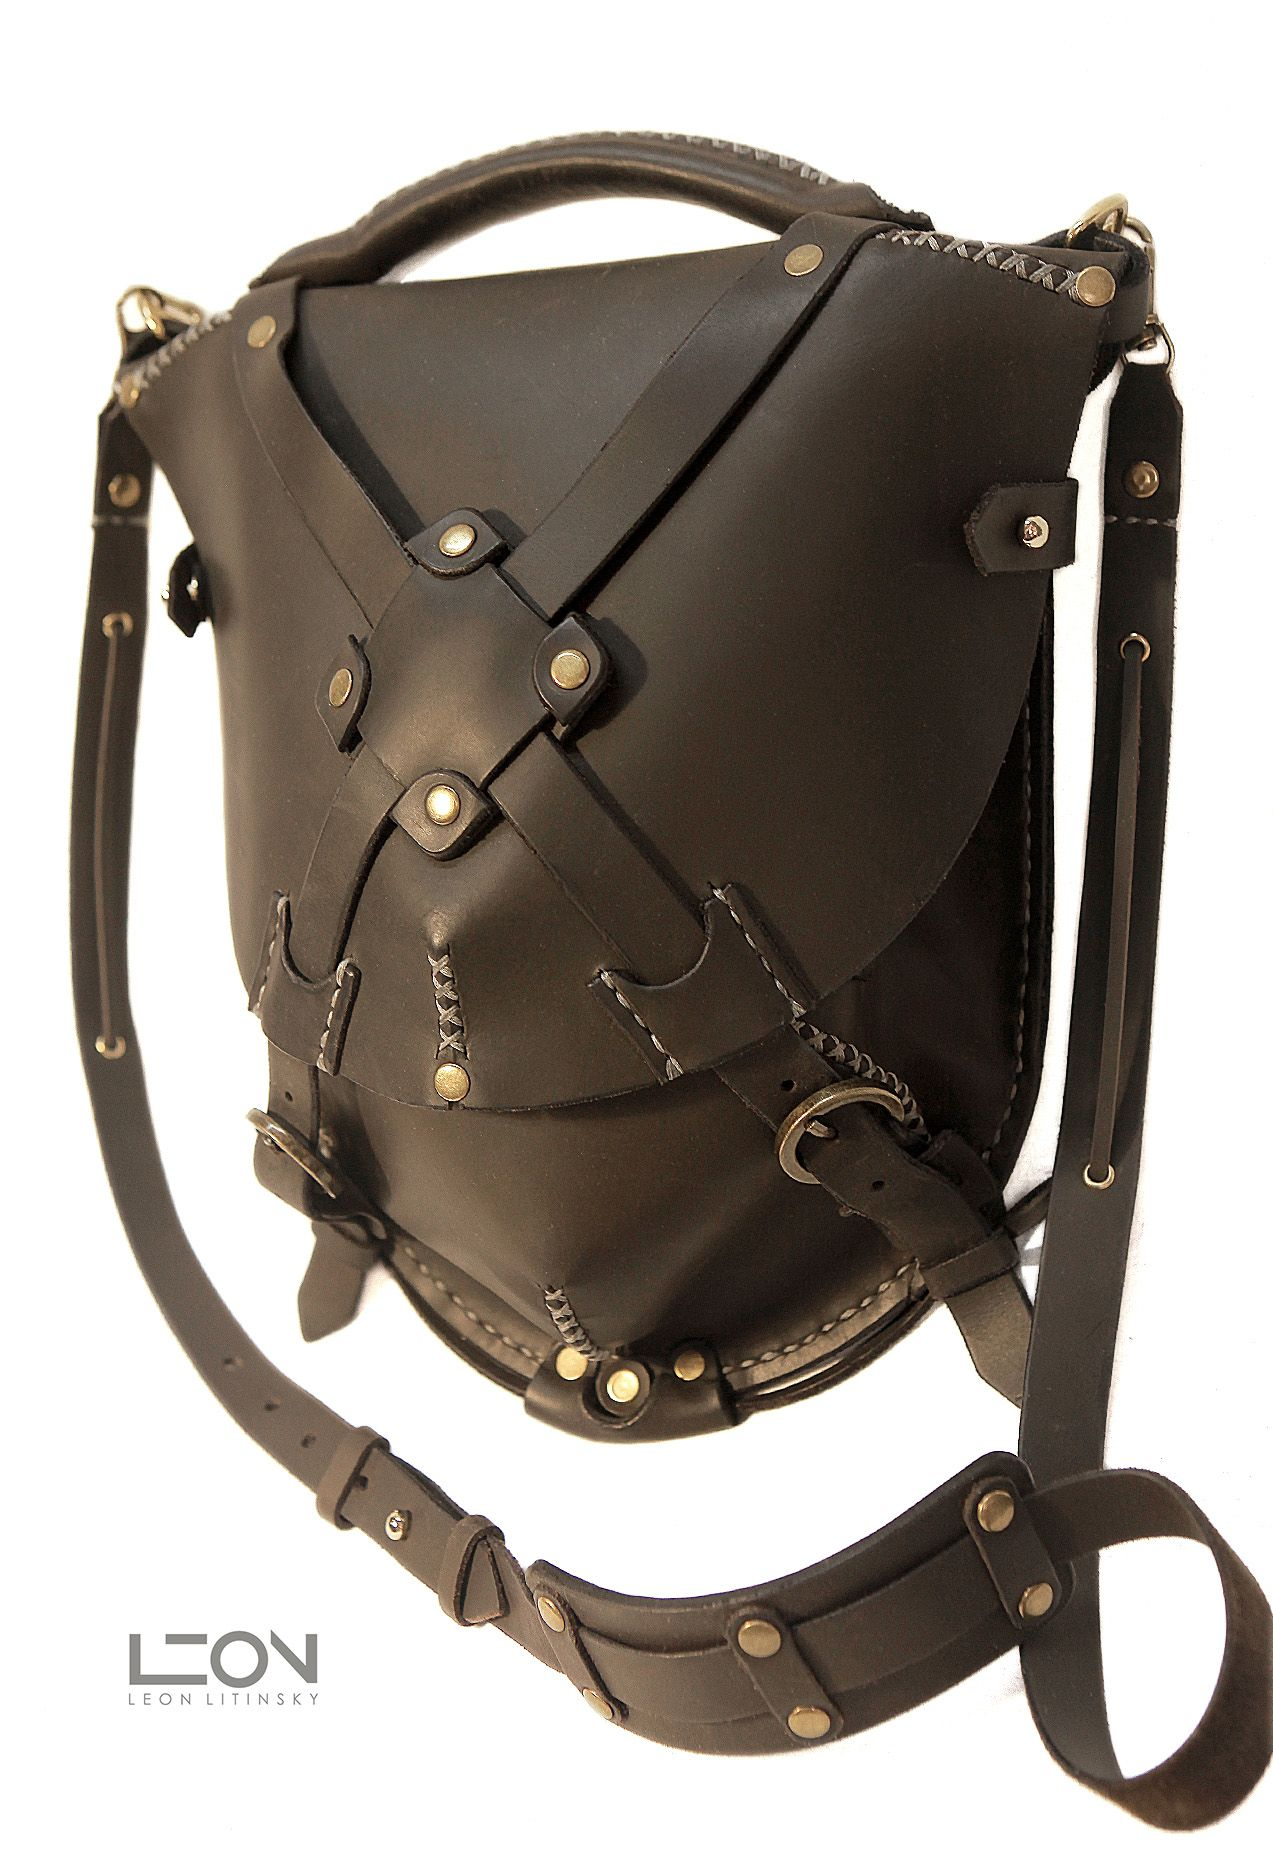 Leather Bag by Leon Litinsky.  New technology- Matte, Full Grain, Waterproof Leather.